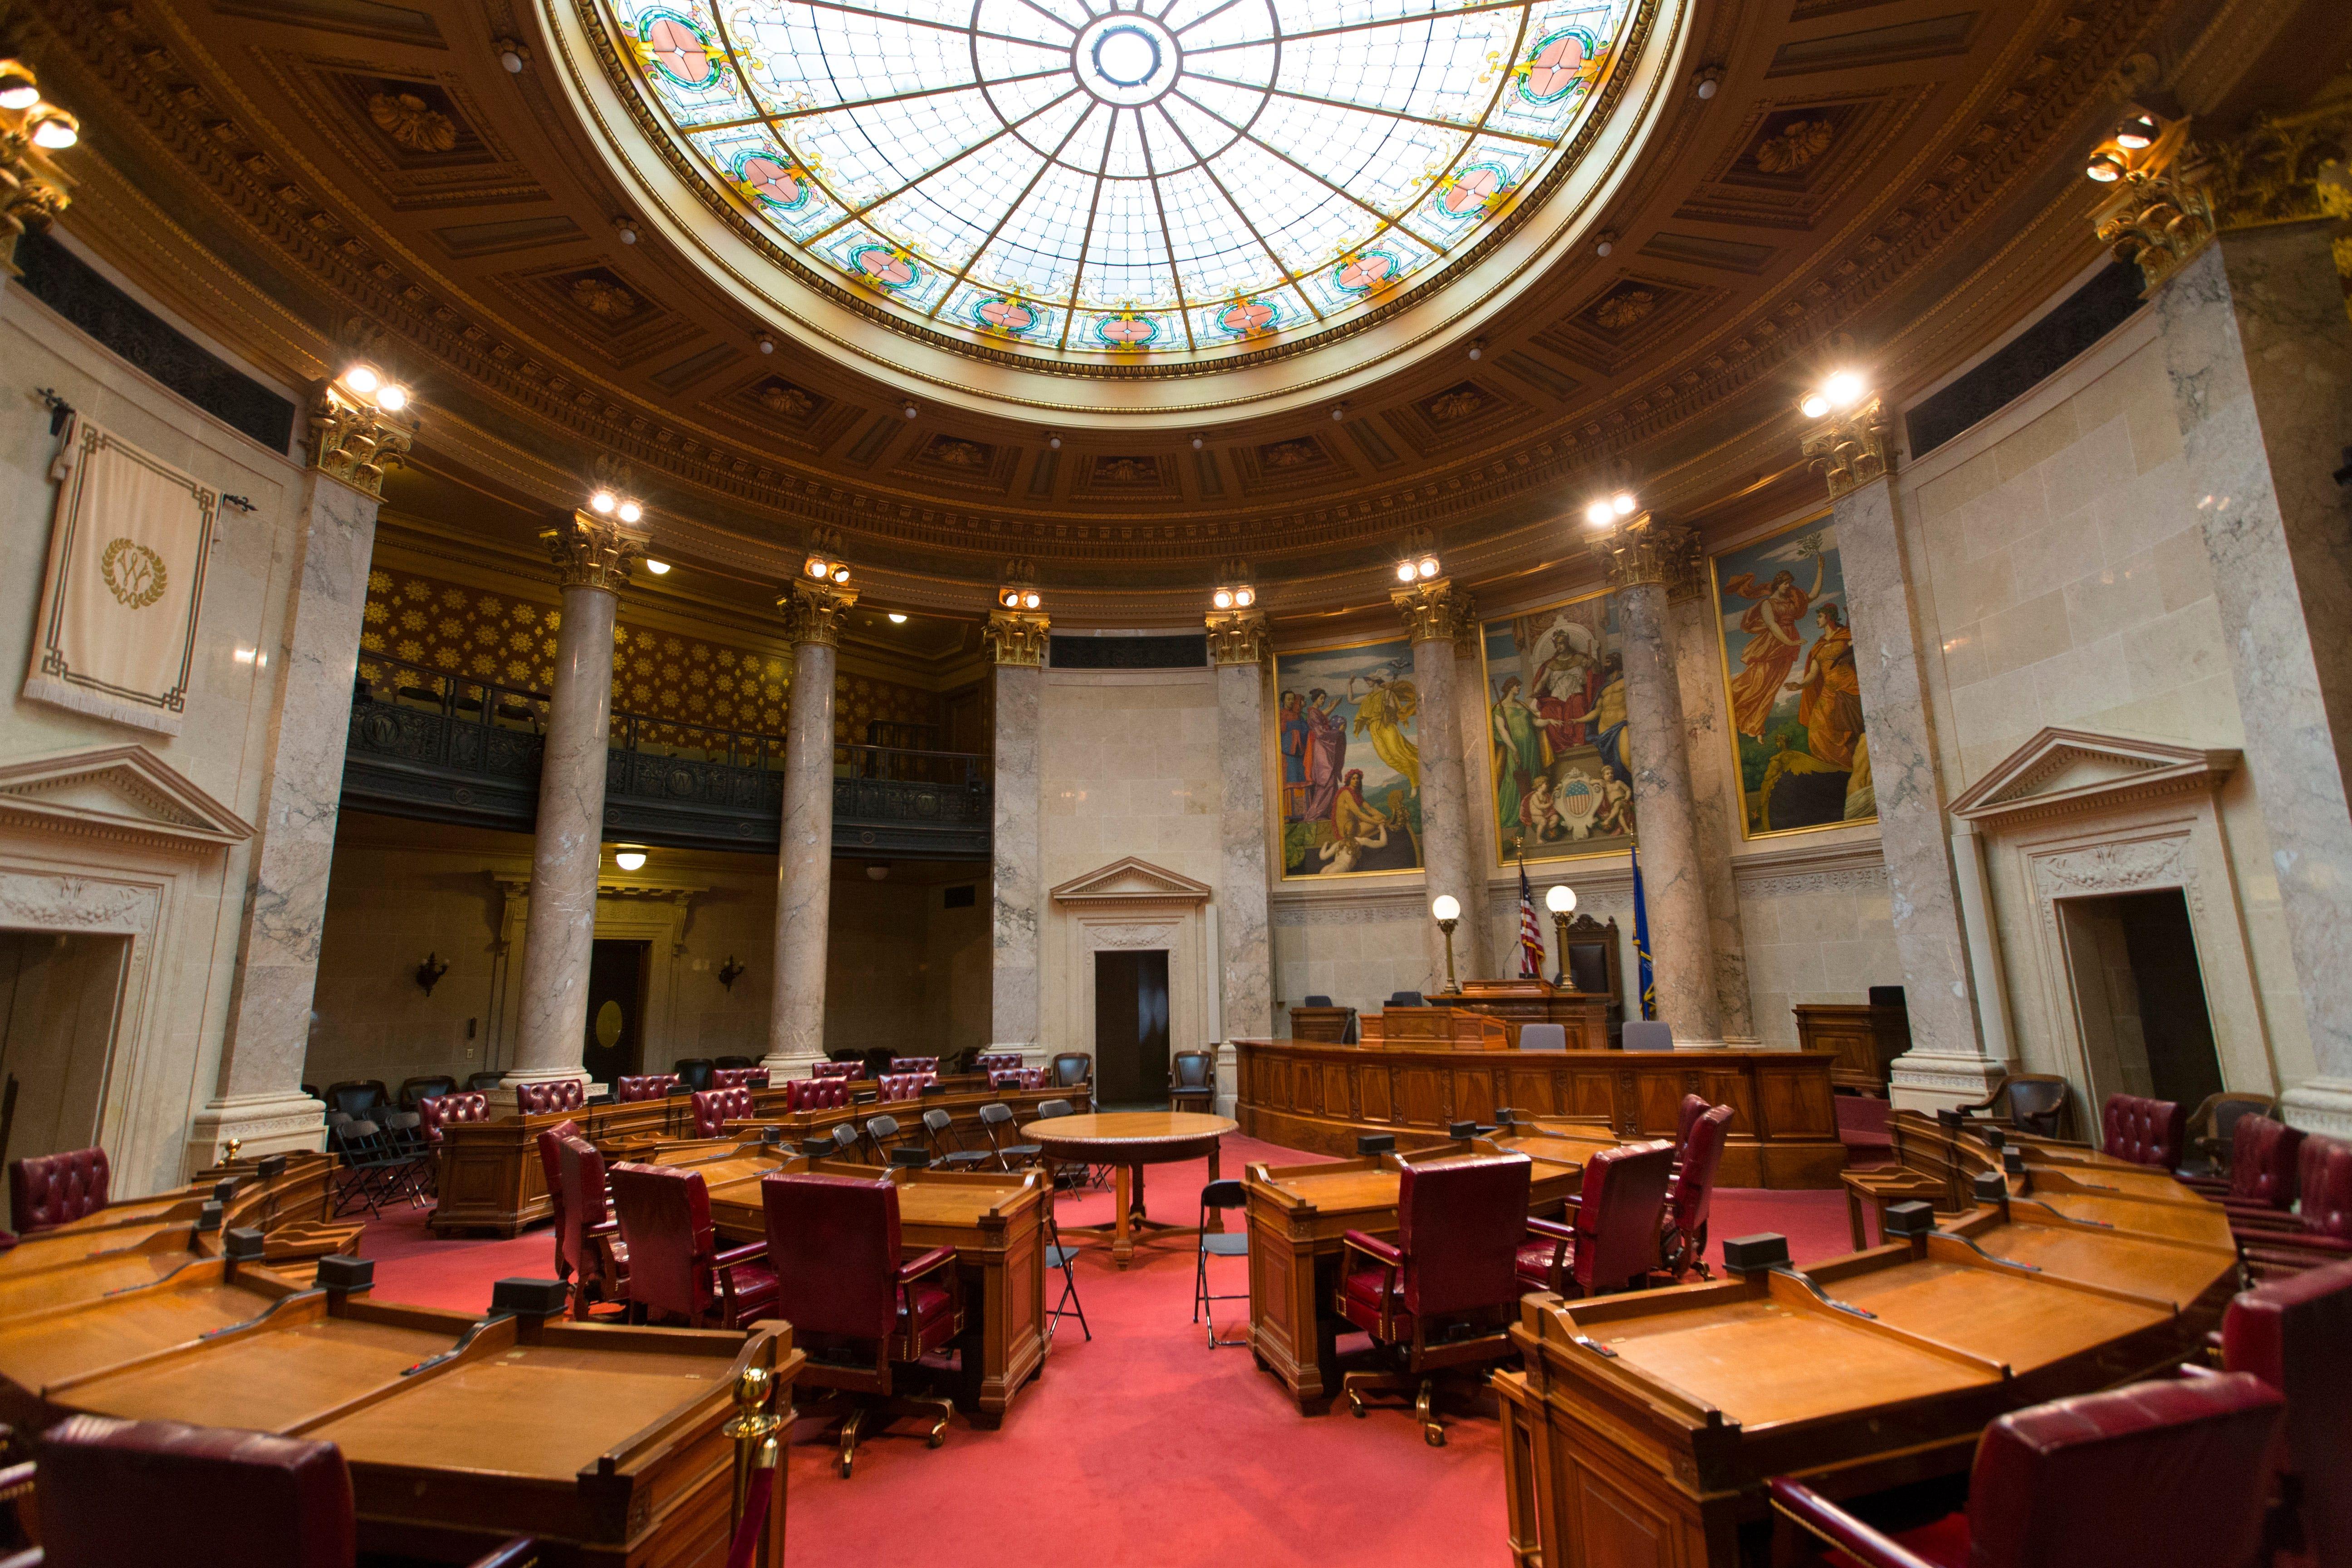 Wisconsin Senate approves Gov.  Walker's $100M school safety plan, rejects gun control   Milwaukee Journal Sentinel